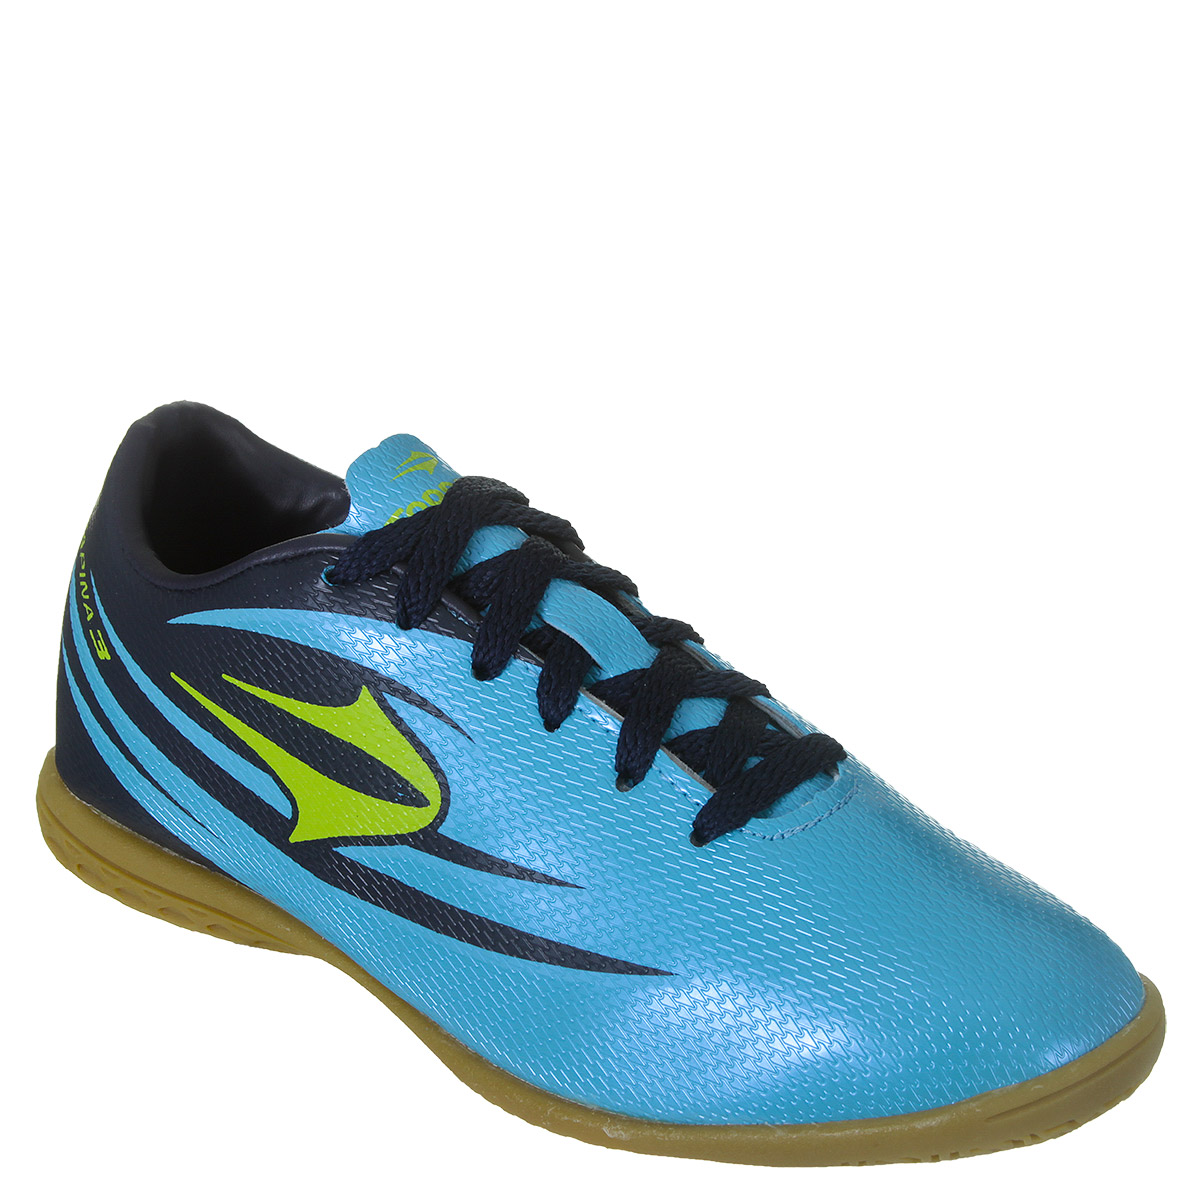 2daf3d420b17f Chuteira Futsal Topper Rapina 3 Masculino - Azul/Limão | World ...